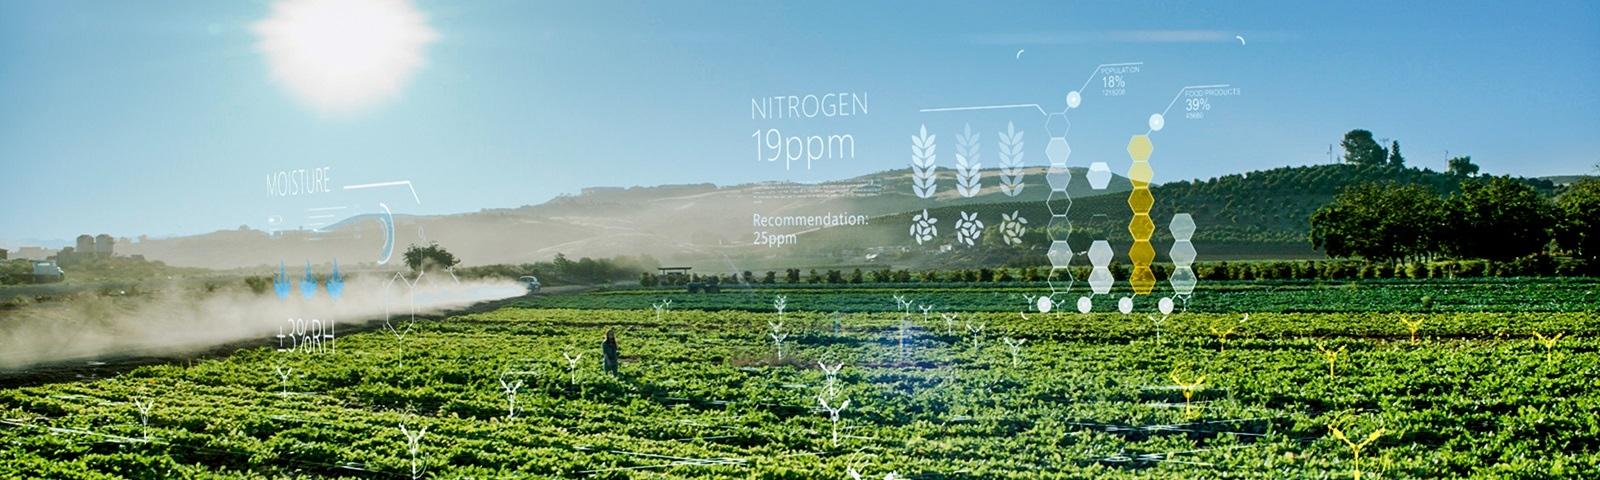 Azure Intelligent Edge field